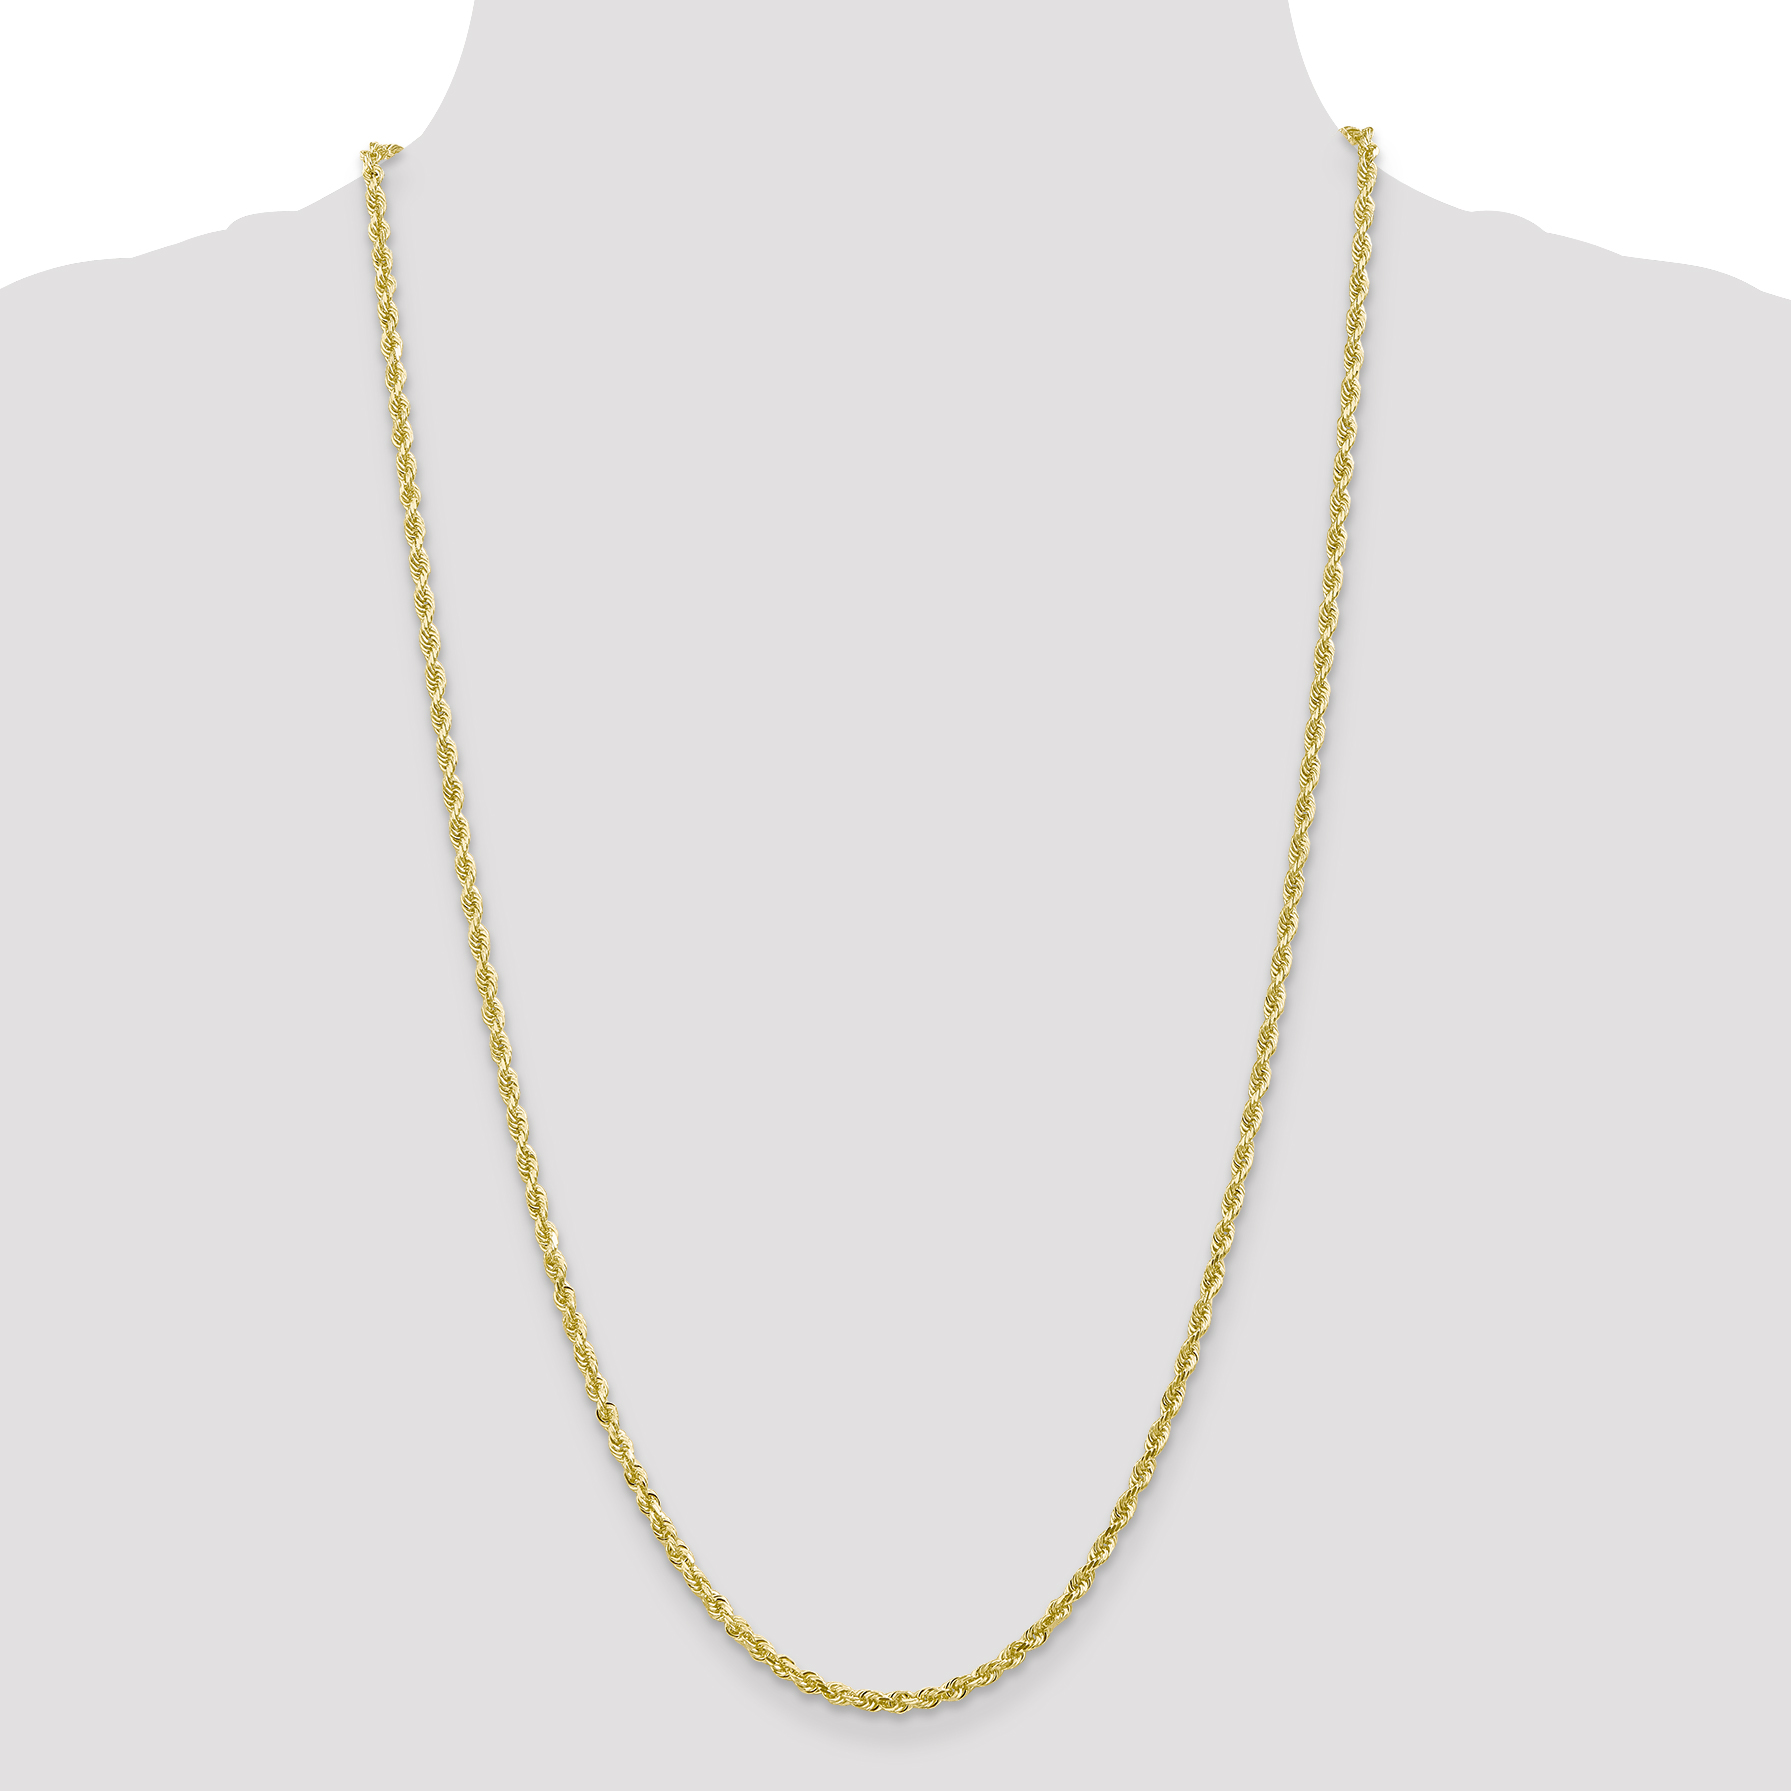 10K Yellow Gold 3.0mm Diamond Cut Quadruple Rope Chain 18 Inch - image 4 of 5